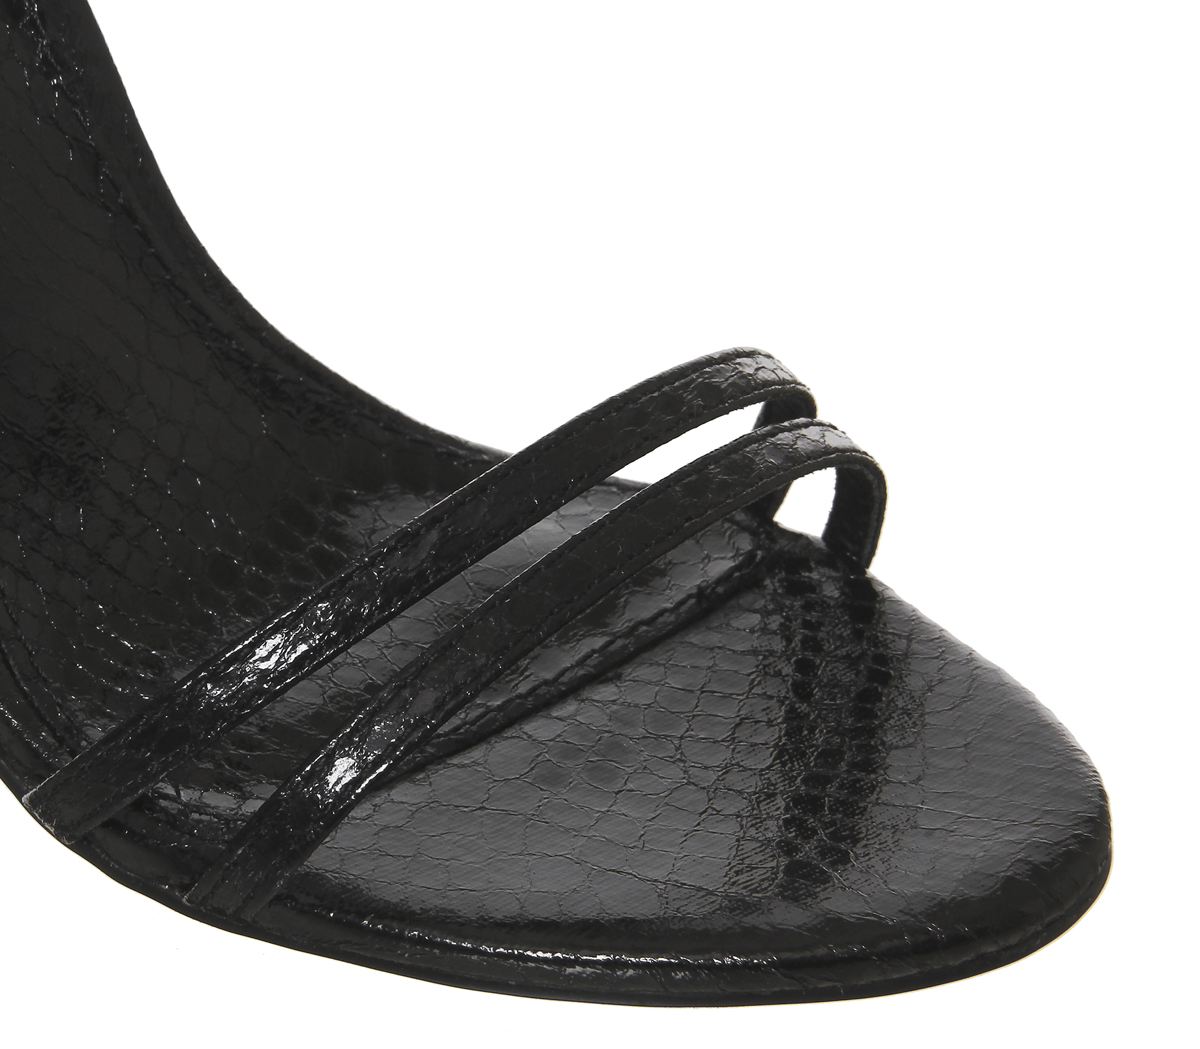 Womens-Office-Hot-Cake-Strappy-Sandal-Heels-Black-Snake-Heels thumbnail 9